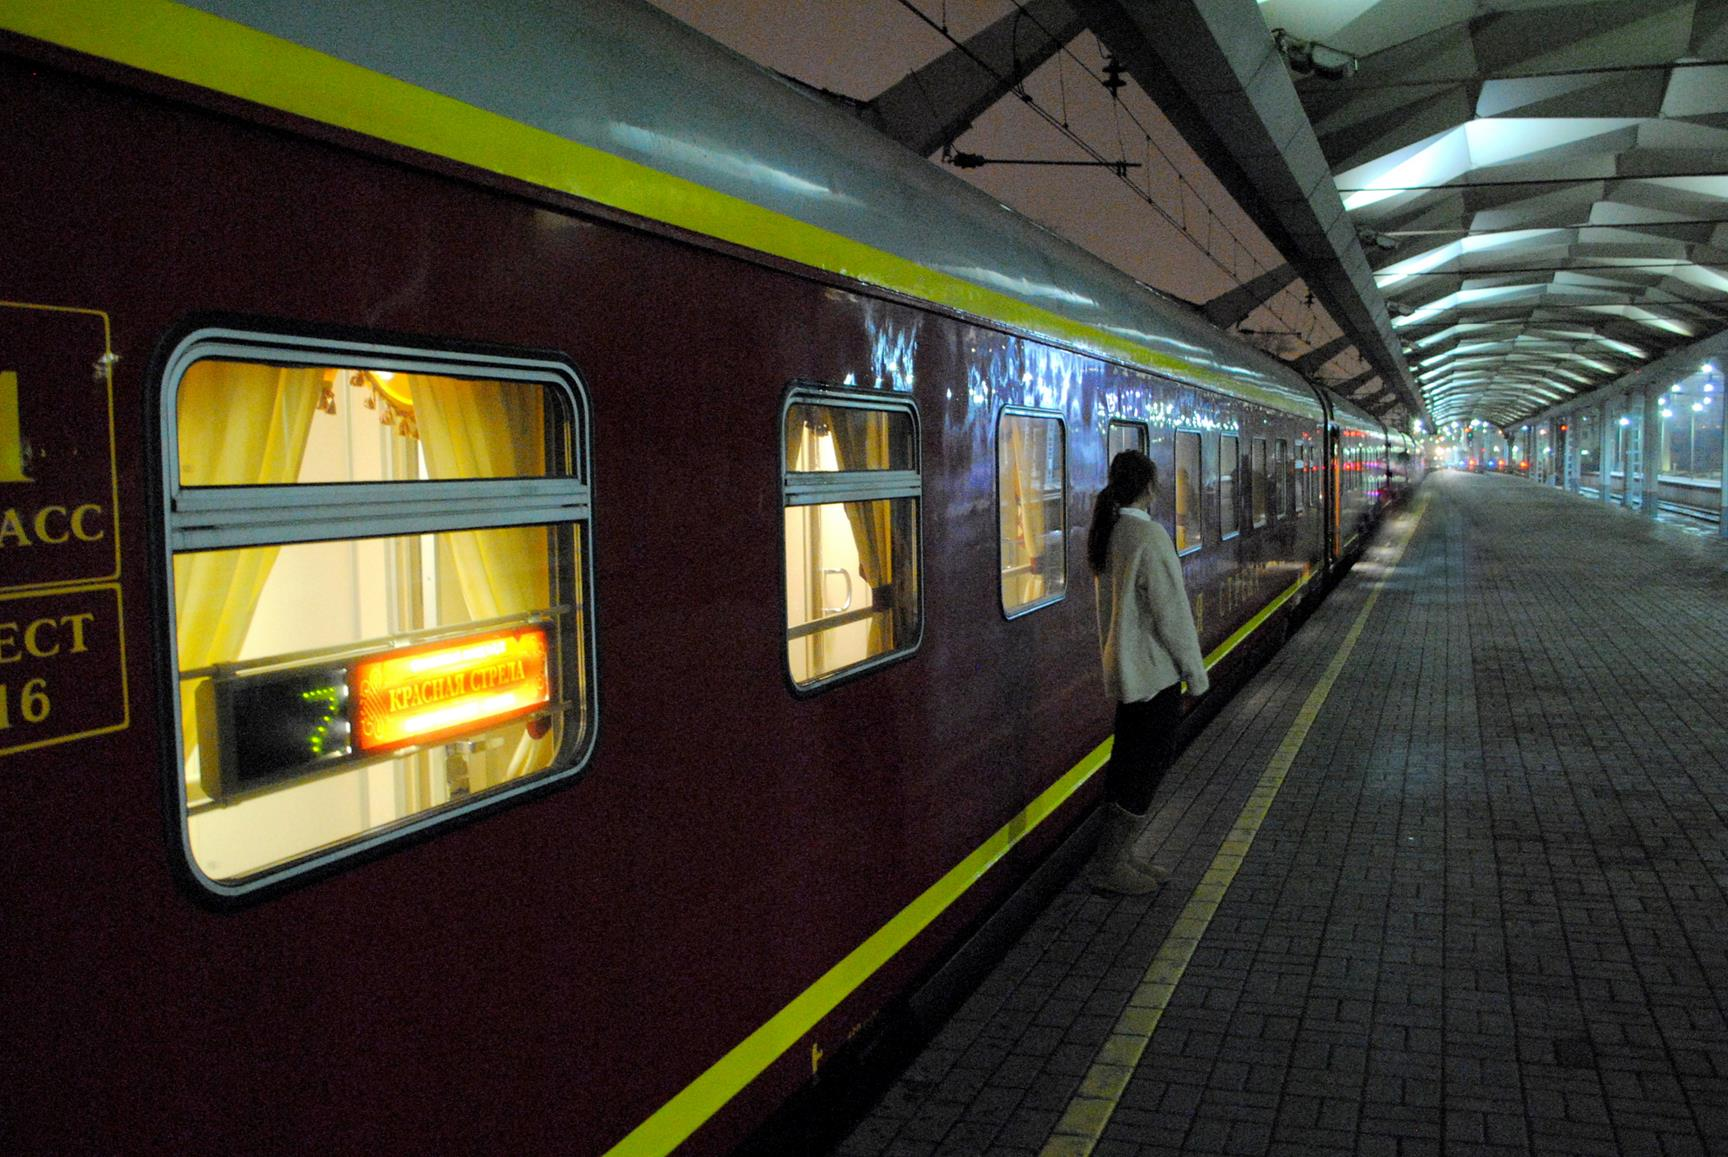 tren-moscu-san-petersburgo-flecha-roja-2